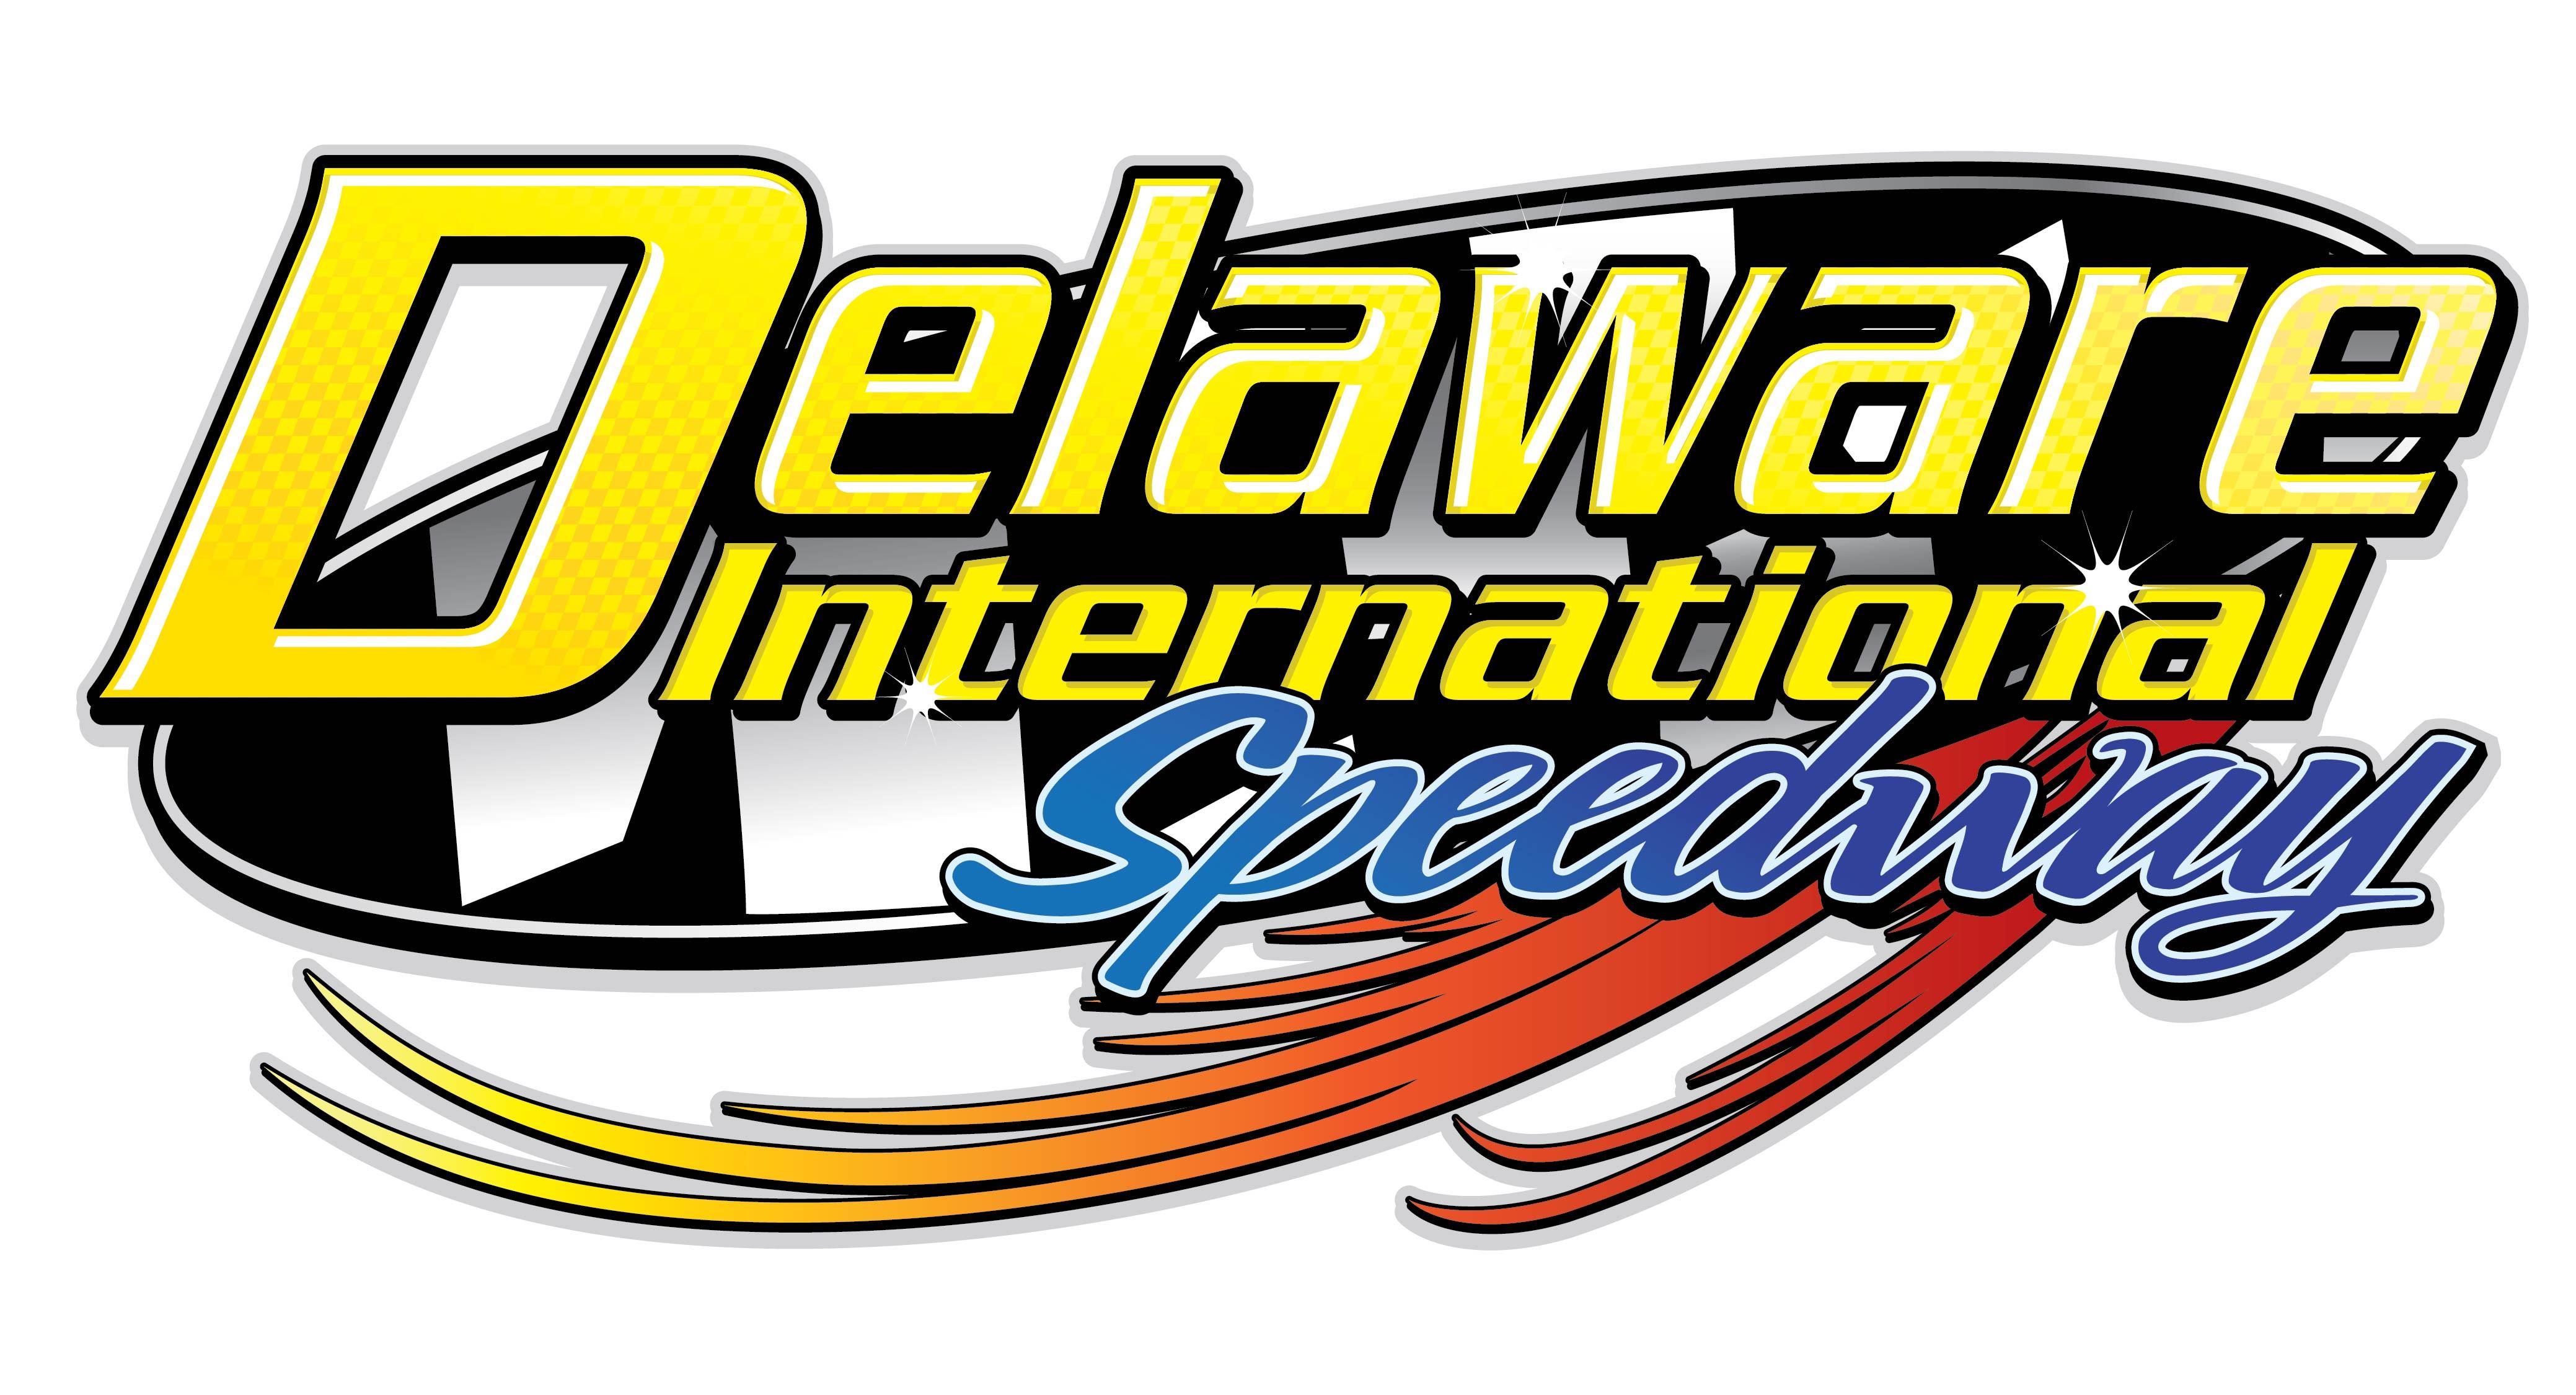 Speedway logo 2014-01